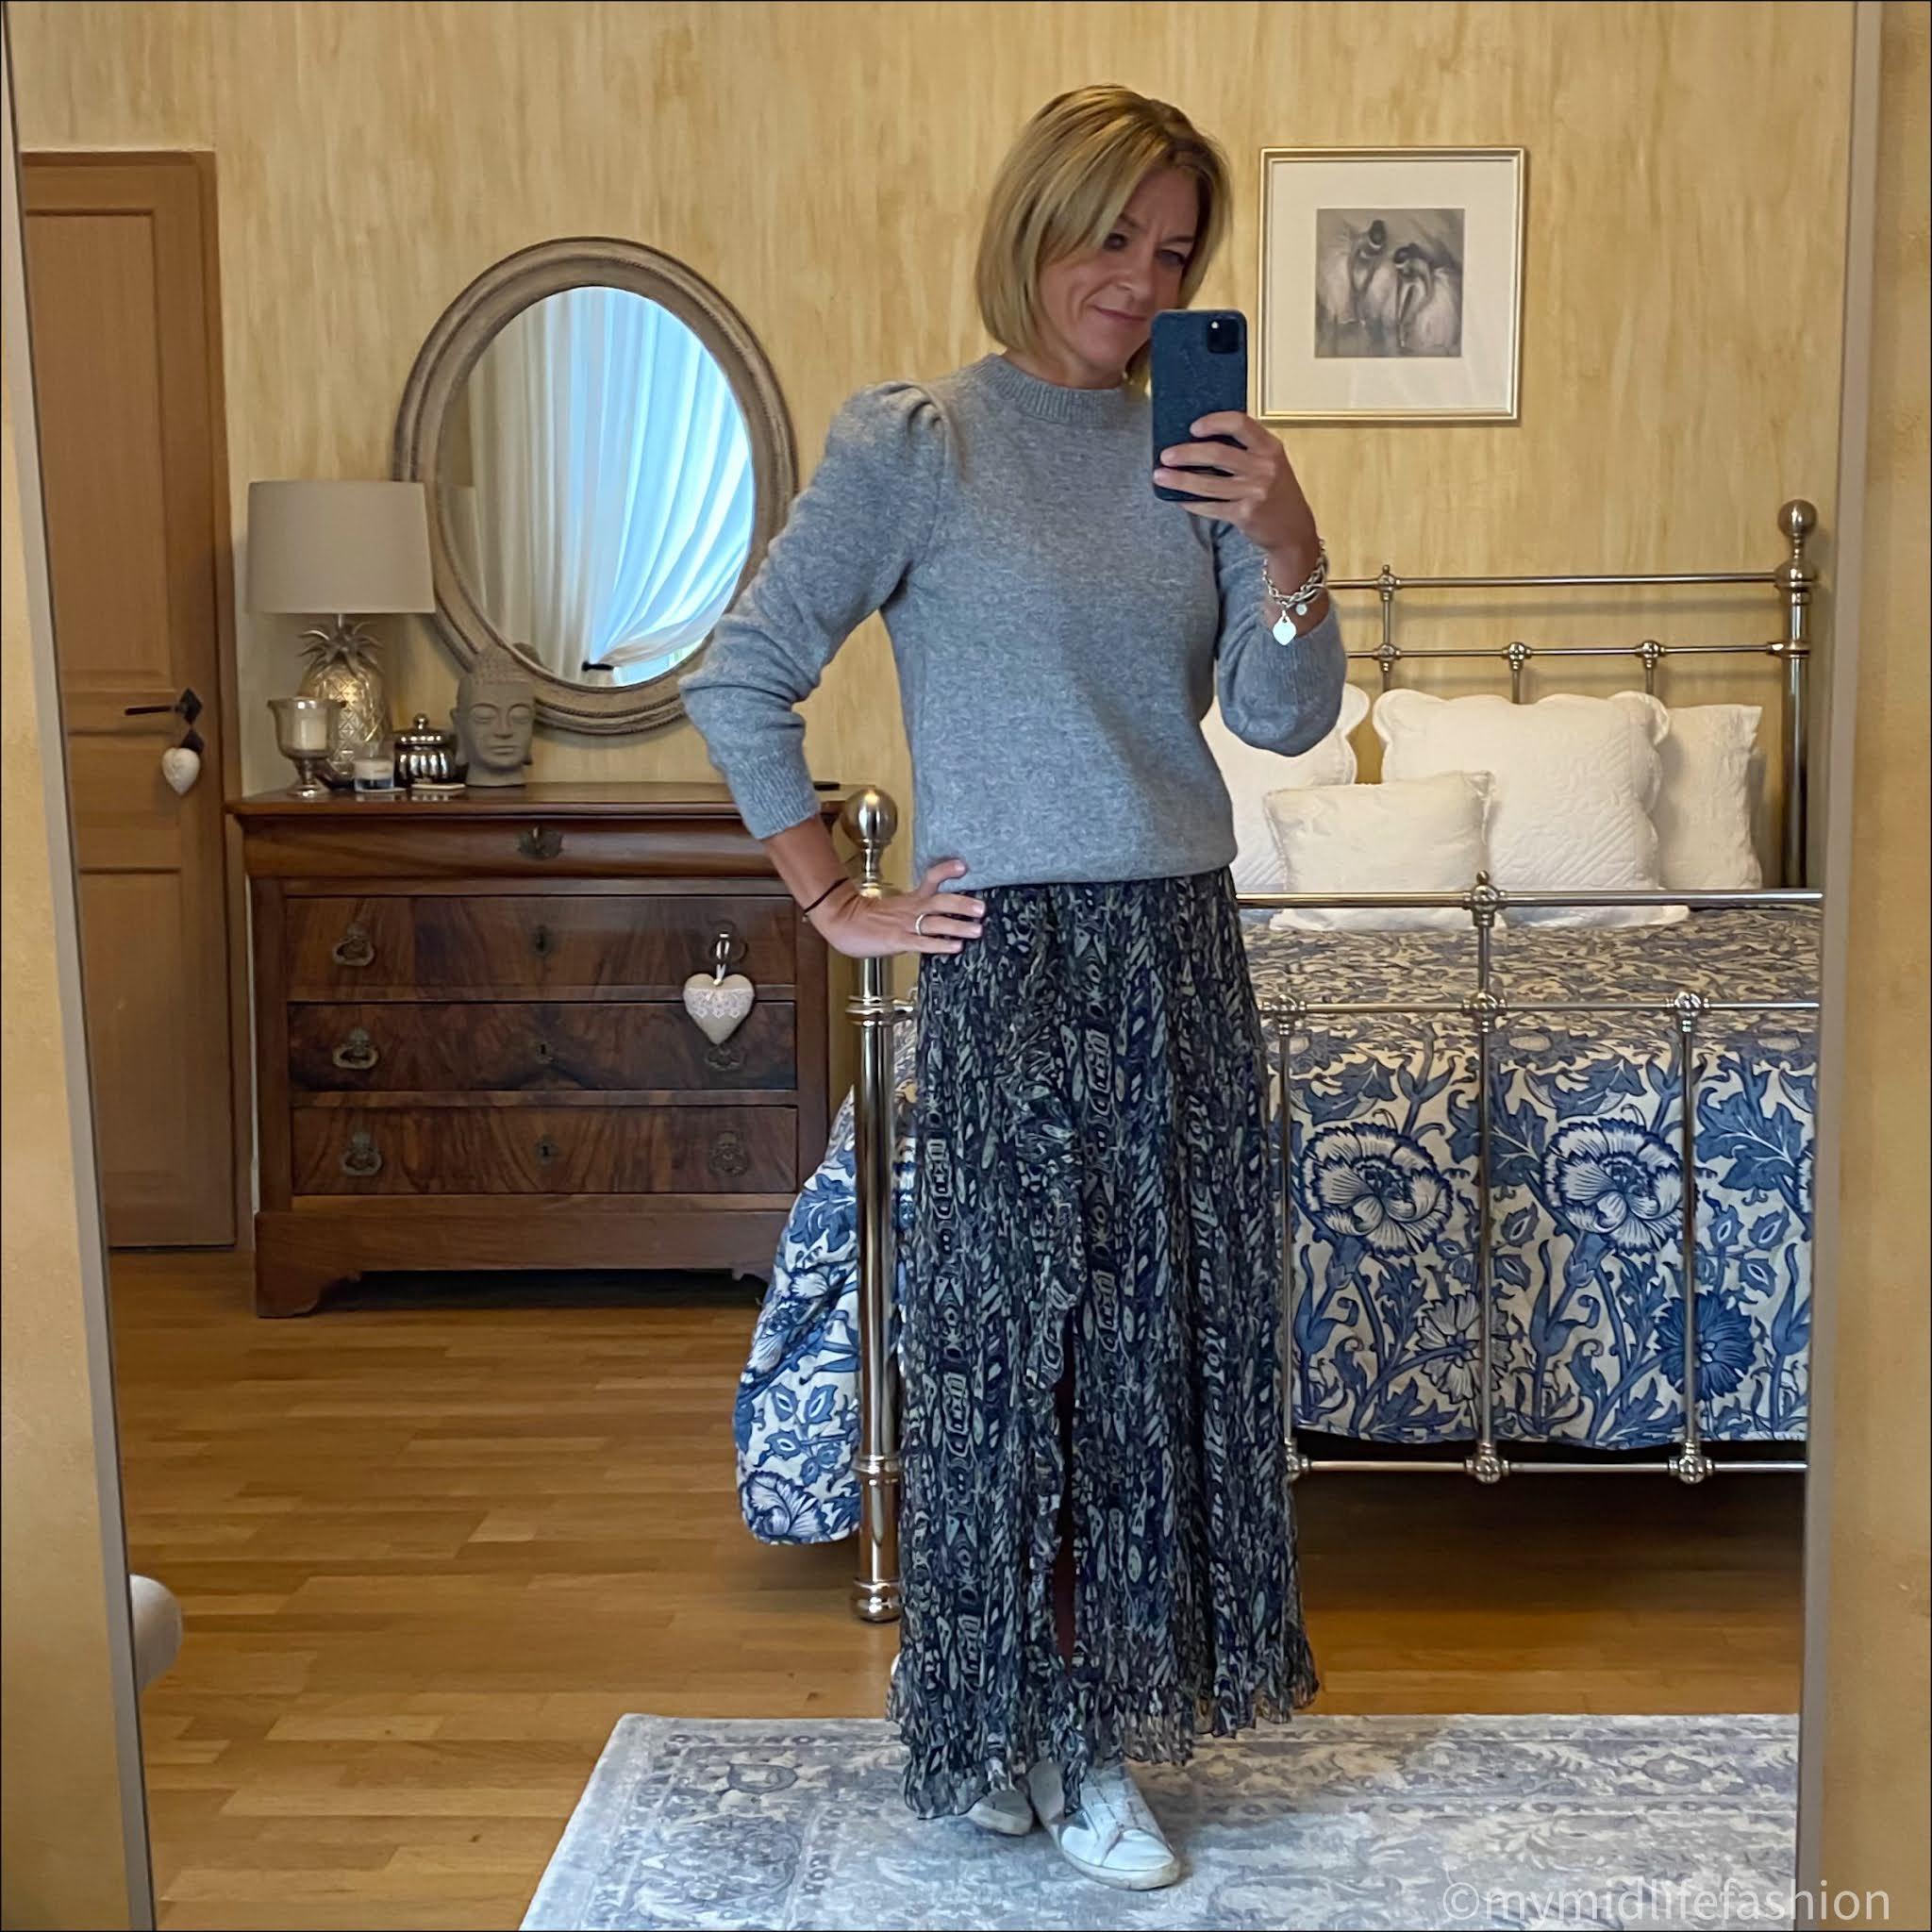 my midlife fashion, baukjen Shannon Jumper, iro Paris maxi skirt, golden goose superstar low top leather trainers